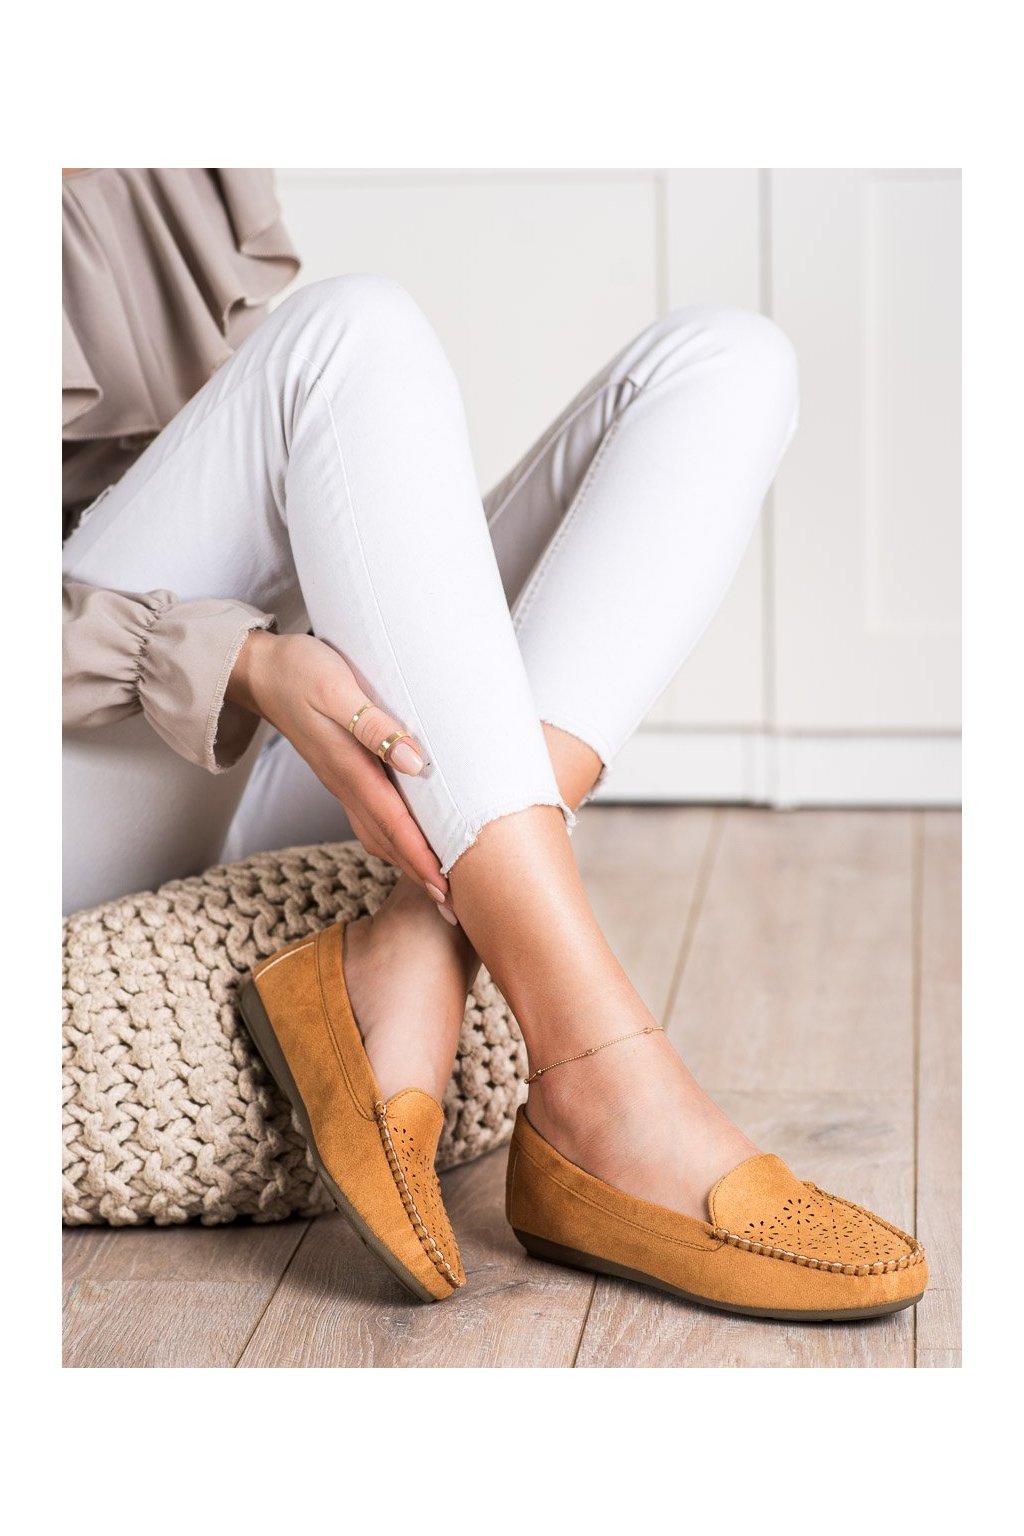 Hnedé mokasíny Best shoes kod 1R6C